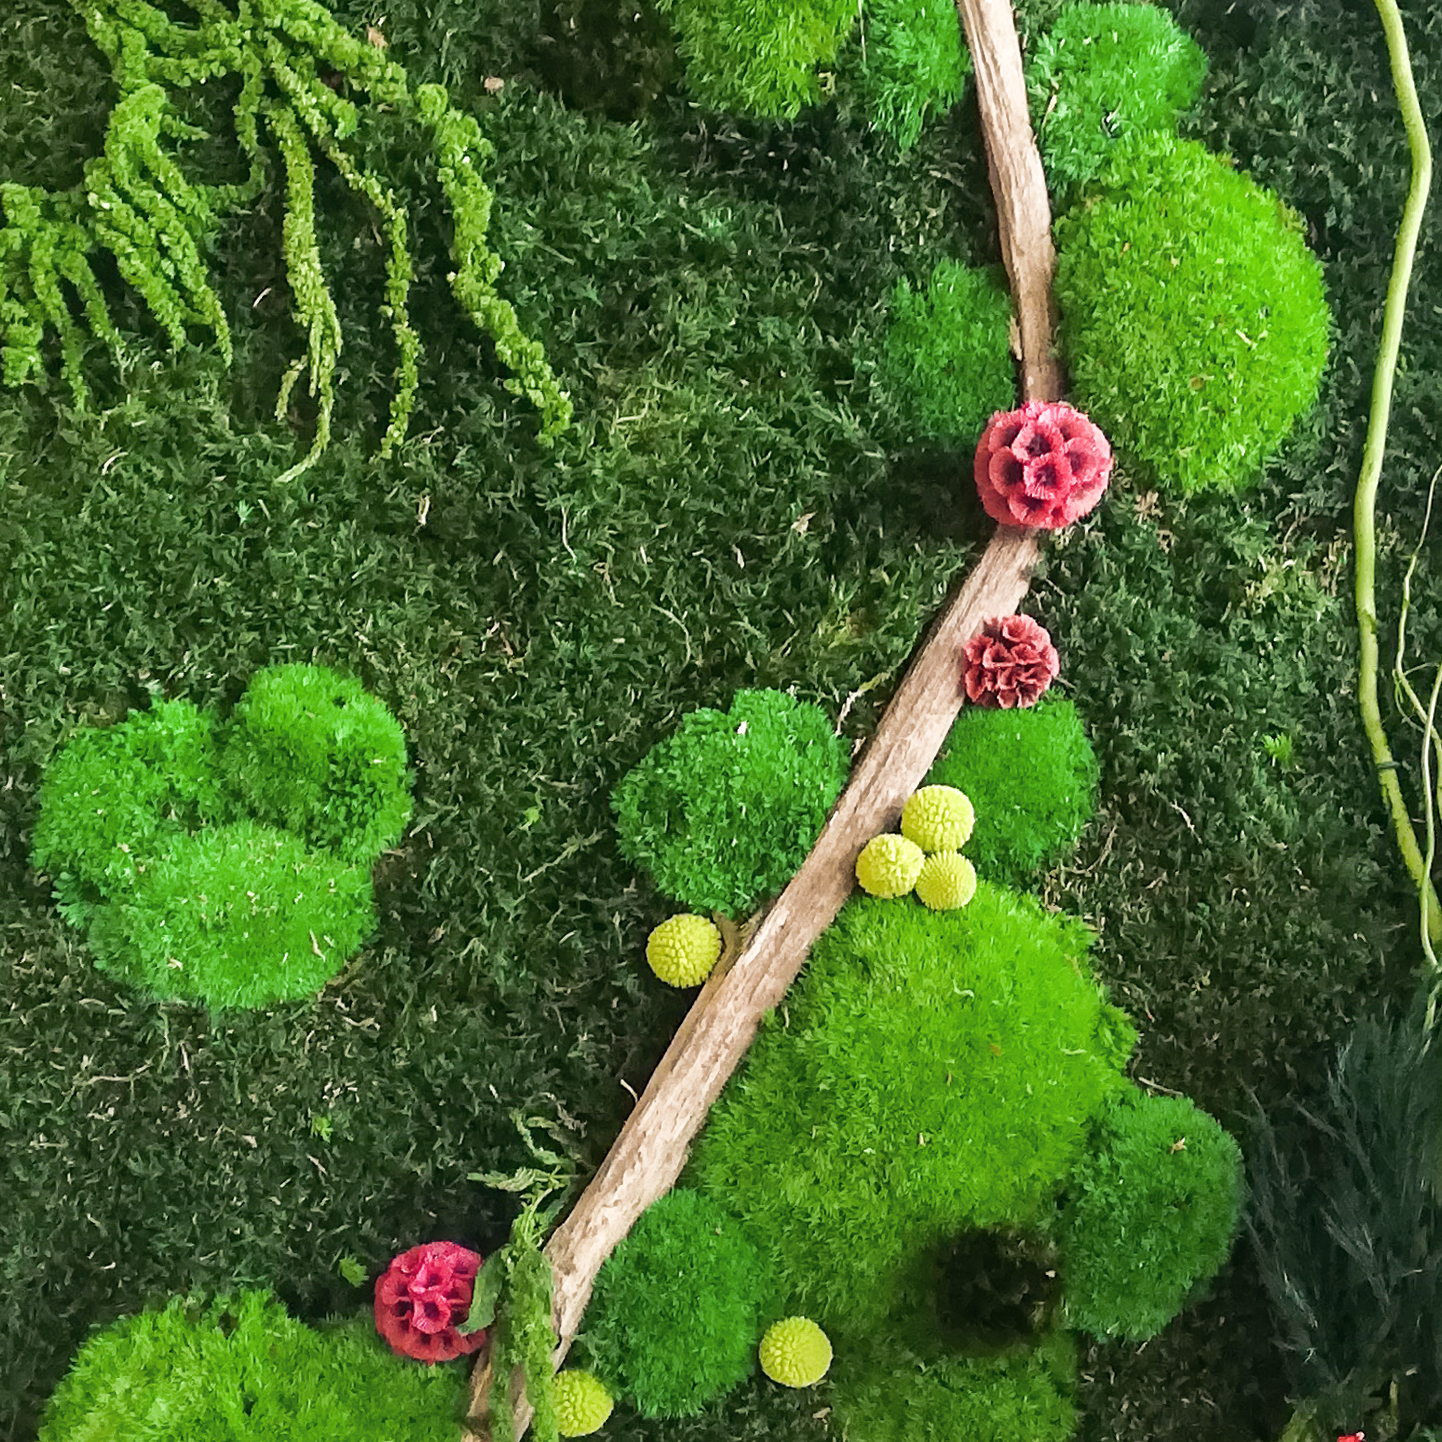 Tableau végétal stabilisé <br/>«hors cadre»